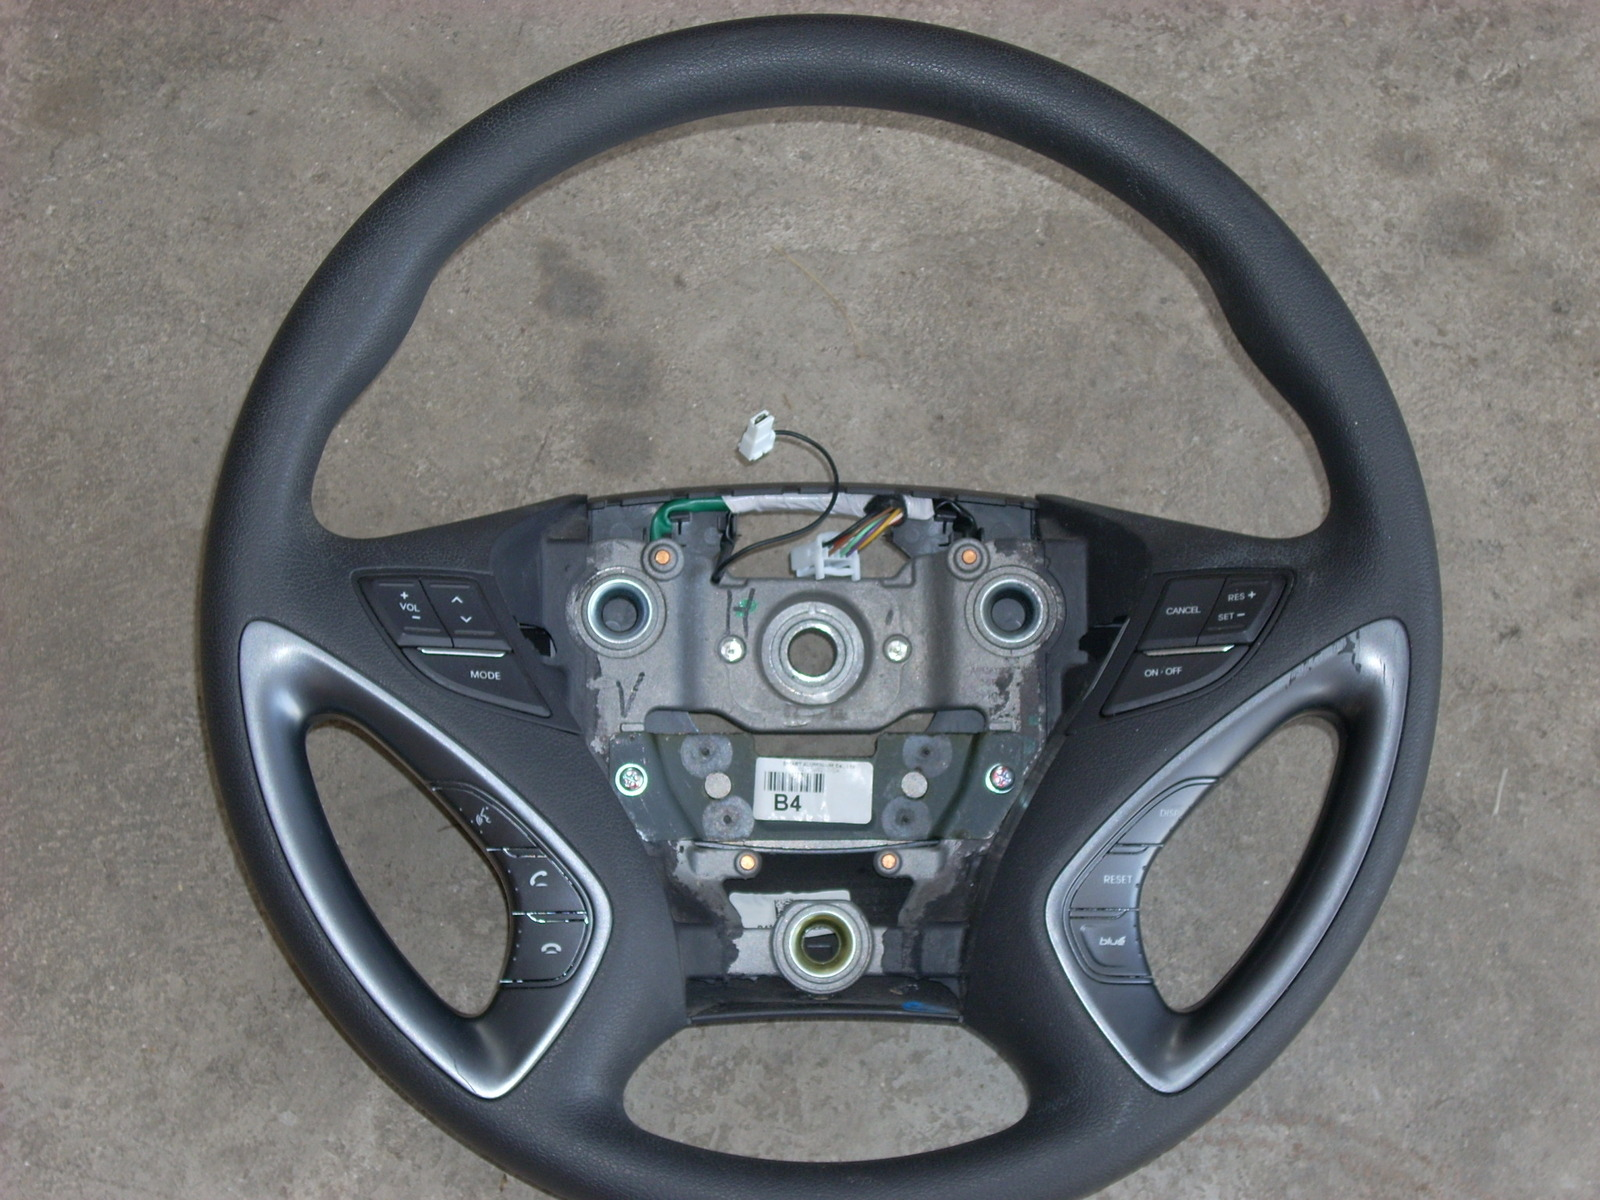 2013 hyundai sonata hybrid steering wheel. Black Bedroom Furniture Sets. Home Design Ideas